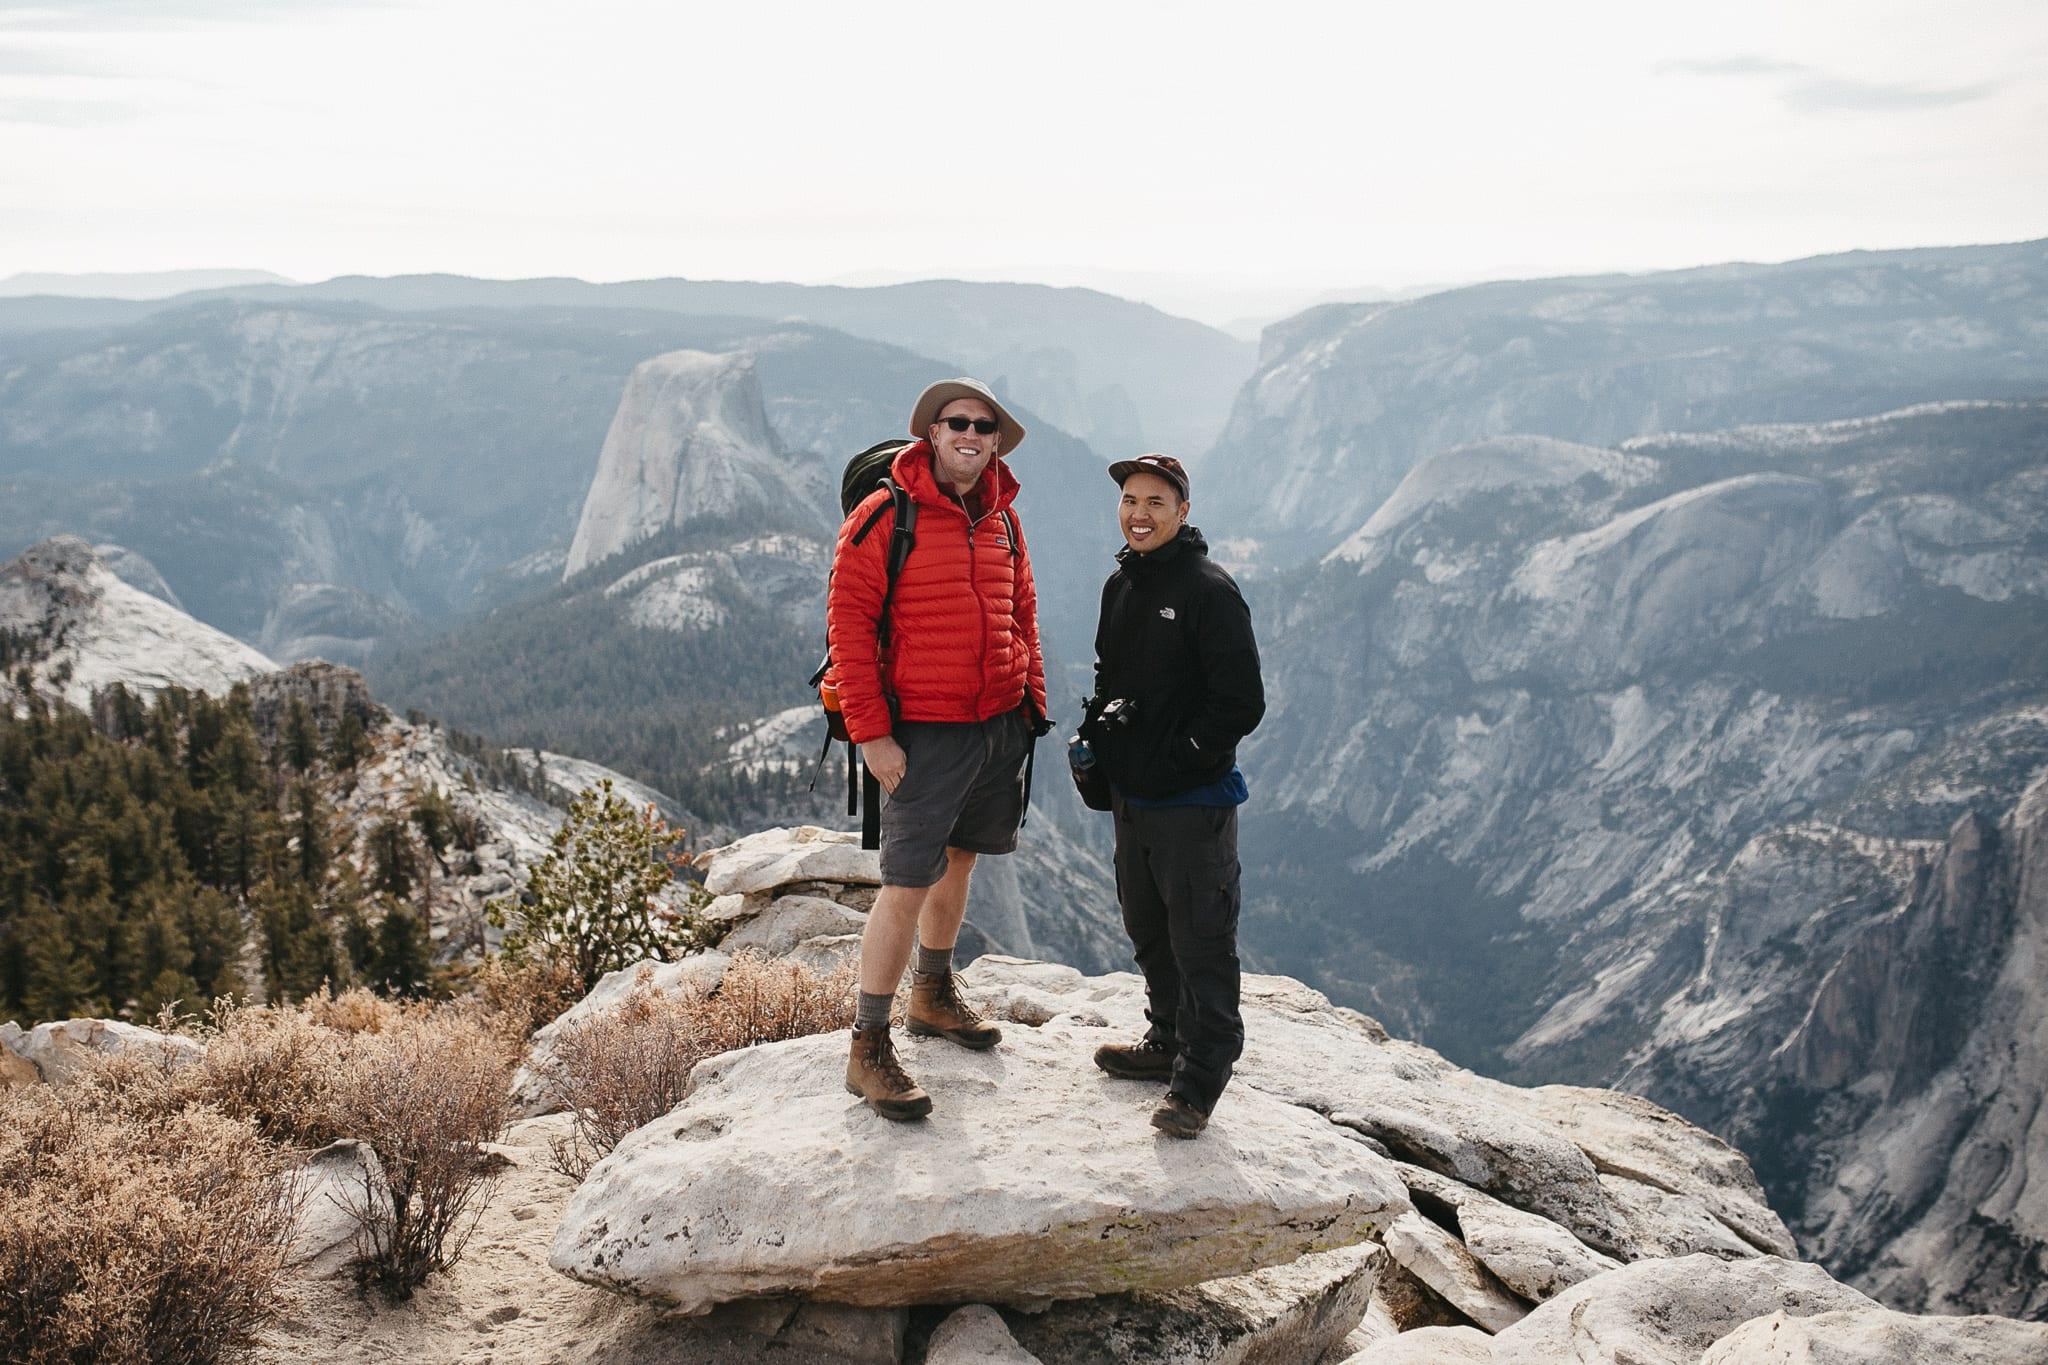 clouds-rest-yosemite-california-engagement-lifestyle-adventure-photographer-27